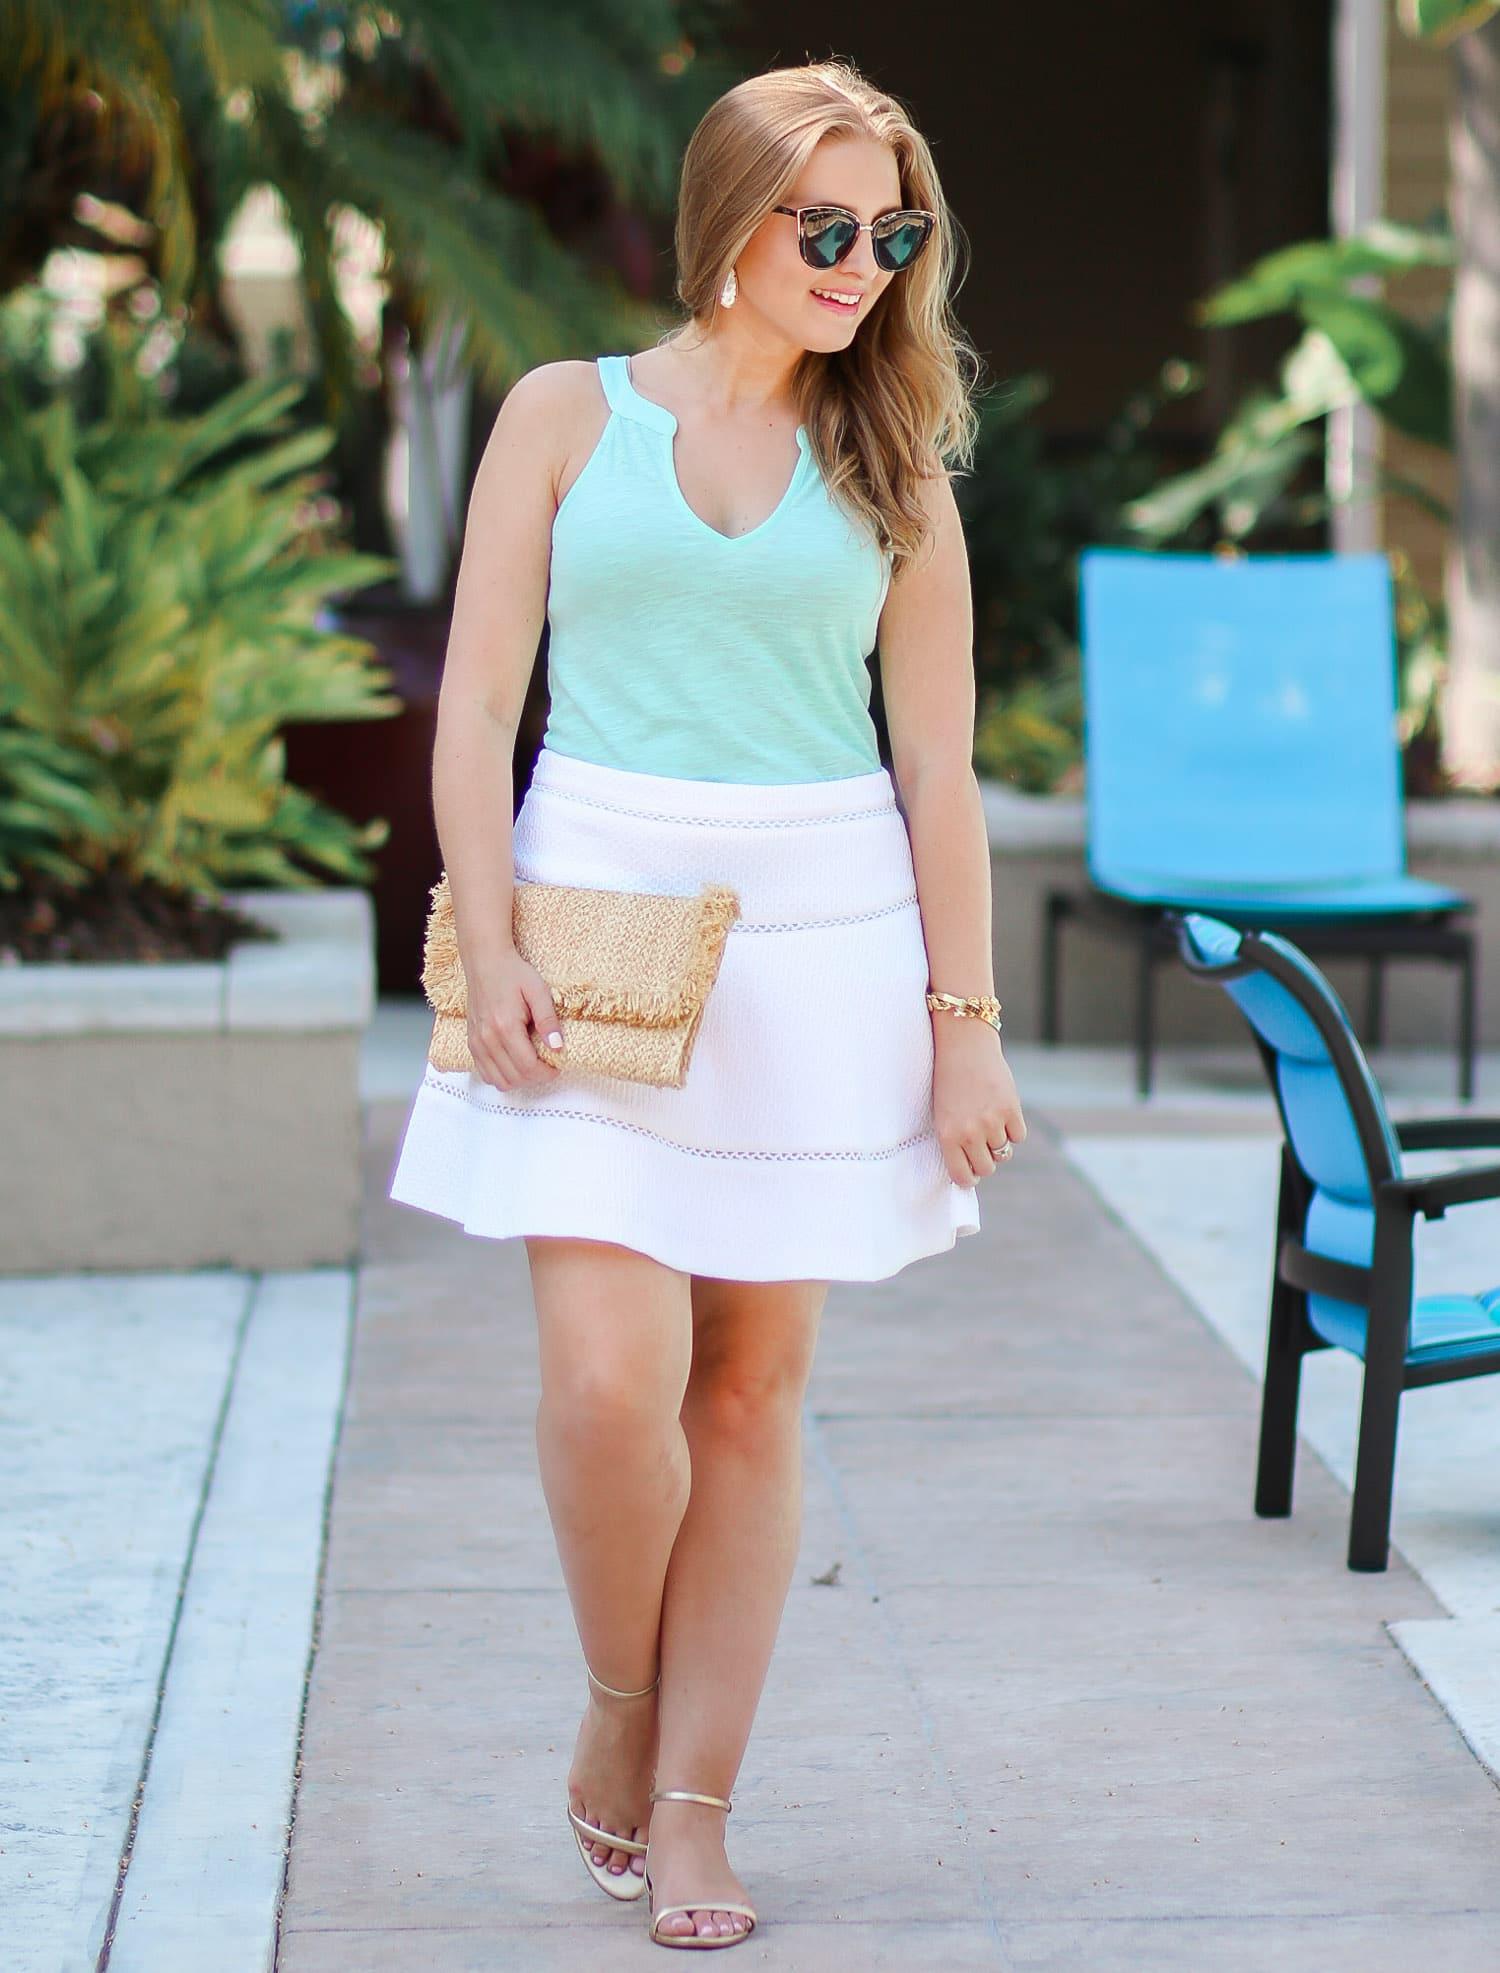 lilly-pulitzer-arya-gold-pineapple-sandals-quay-my-girl-sunglasses-banana-republic-white-skirt-ashley-brooke-3106